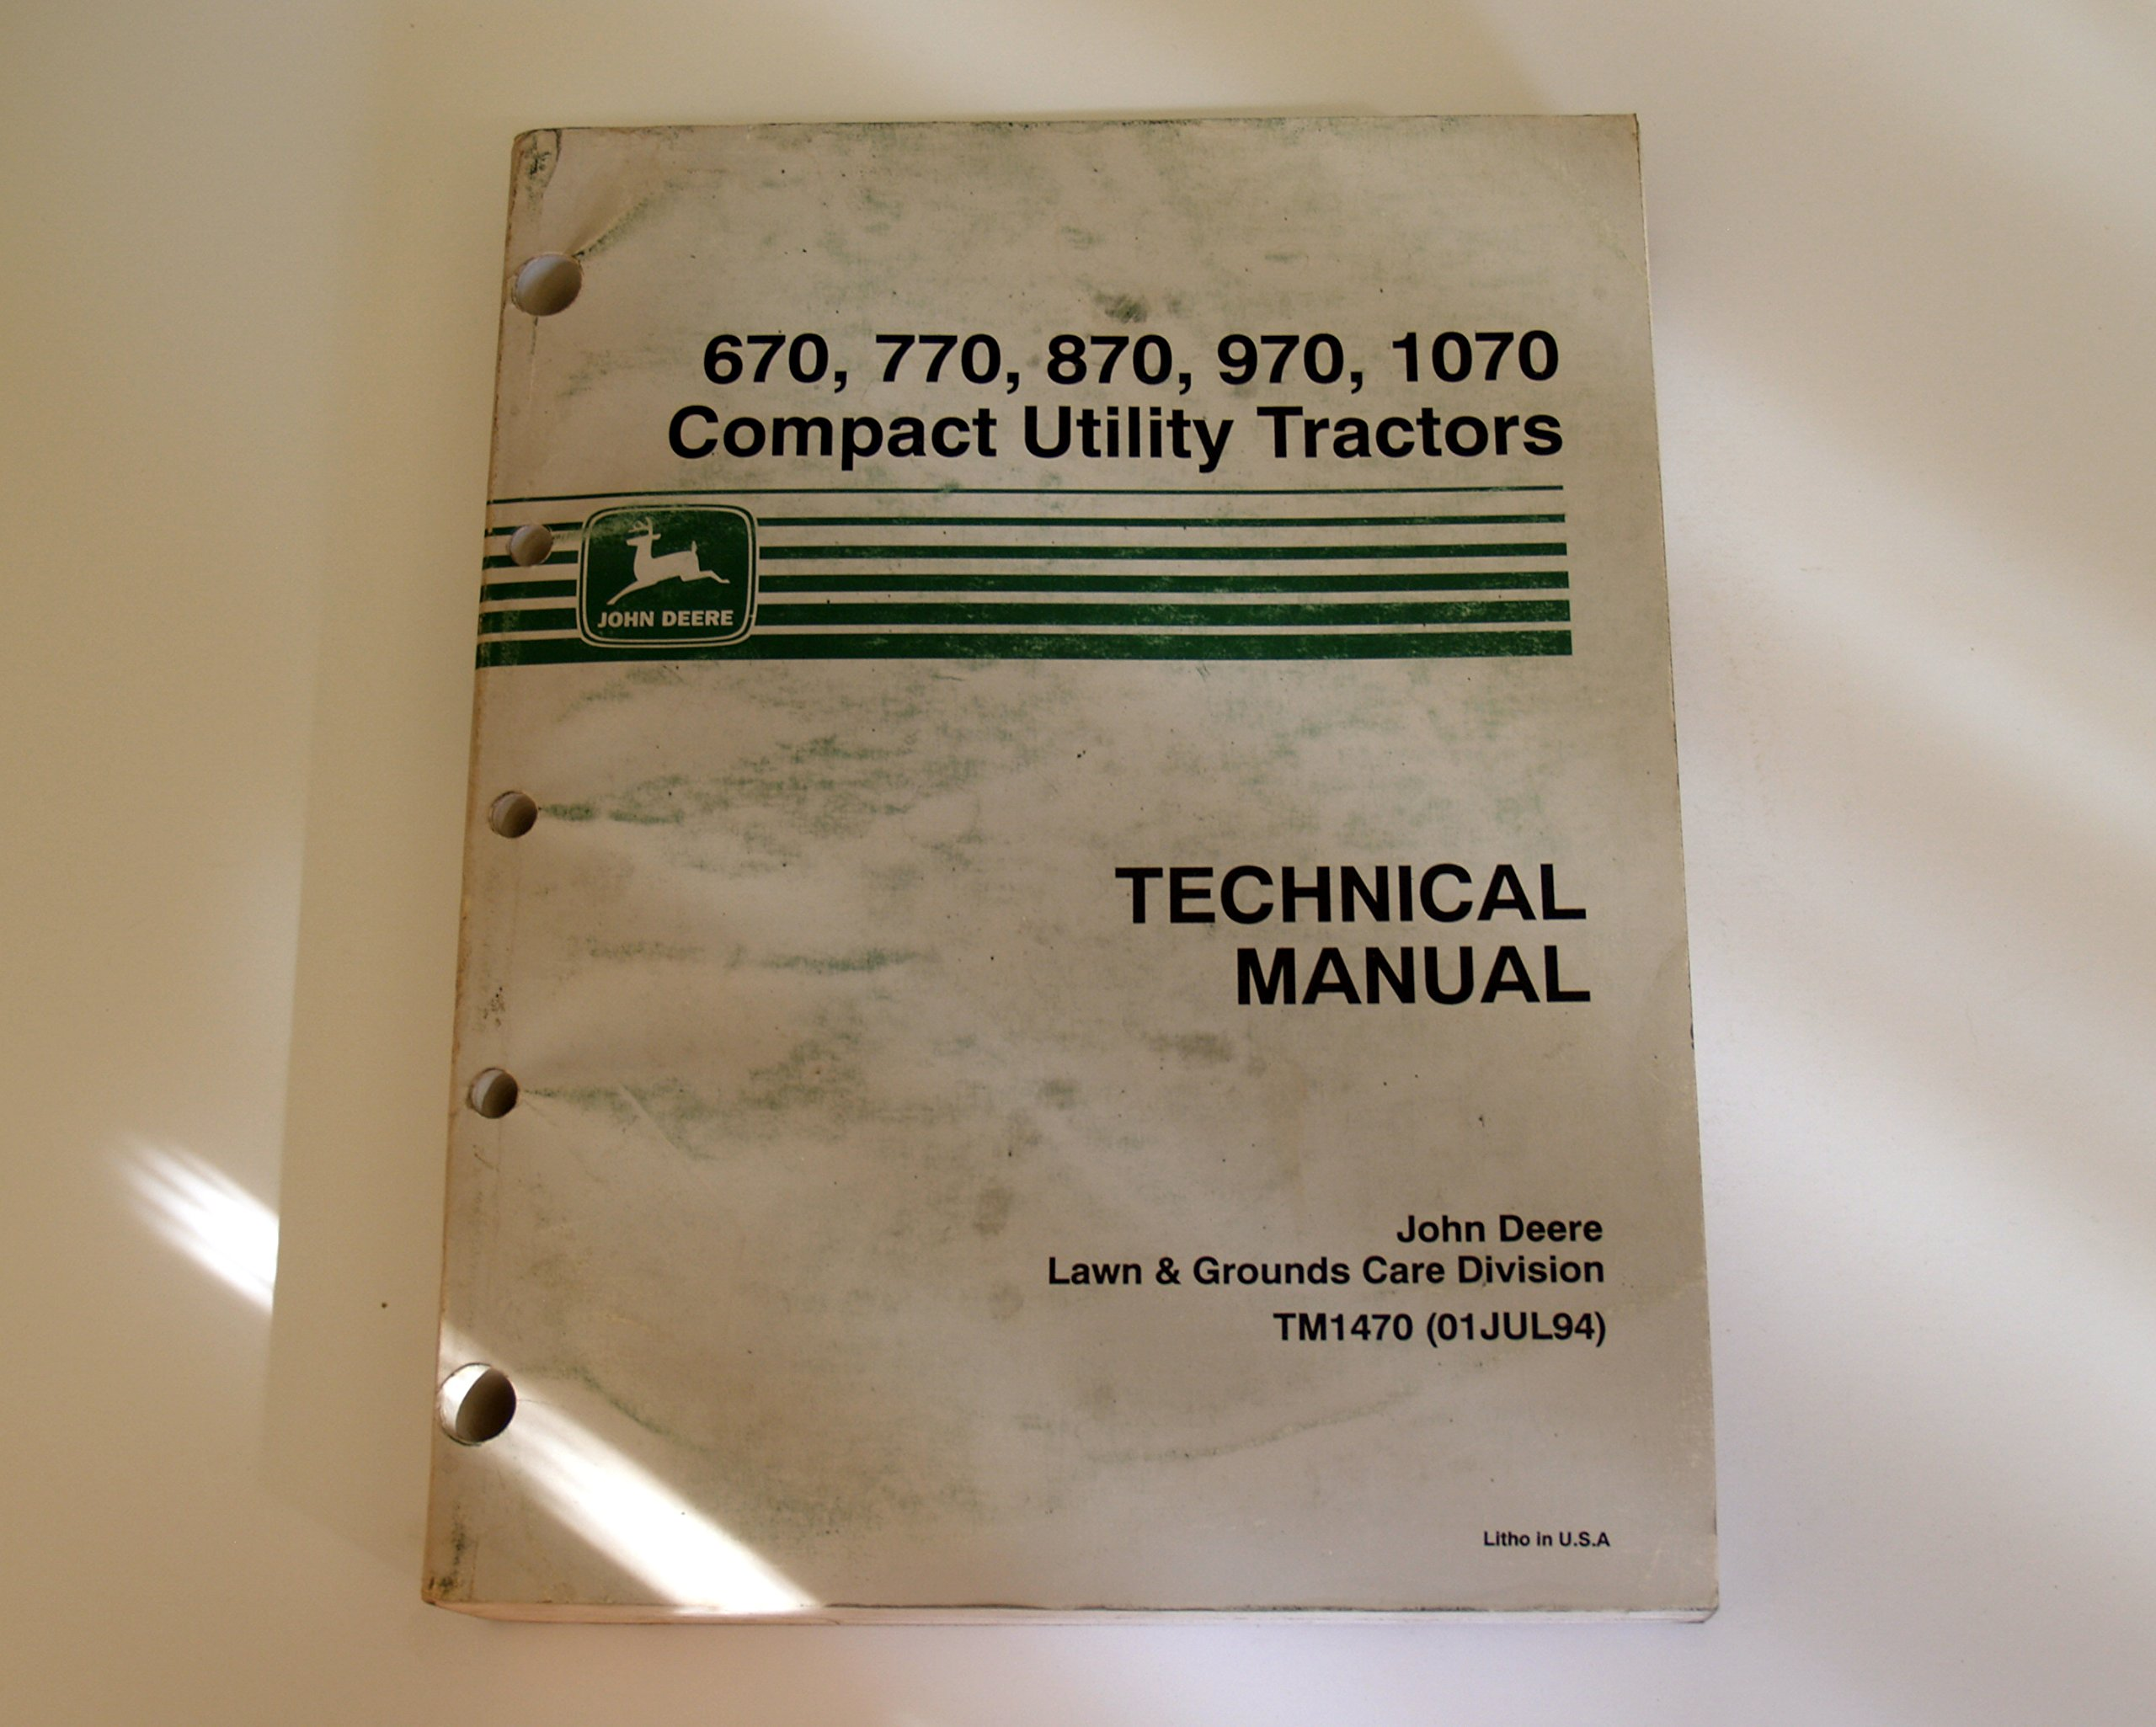 John Deere 670 770 870 970 1070 Compact Utility Tractor Technical Manual  tm1470: John Deere: 0739718155824: Amazon.com: Books